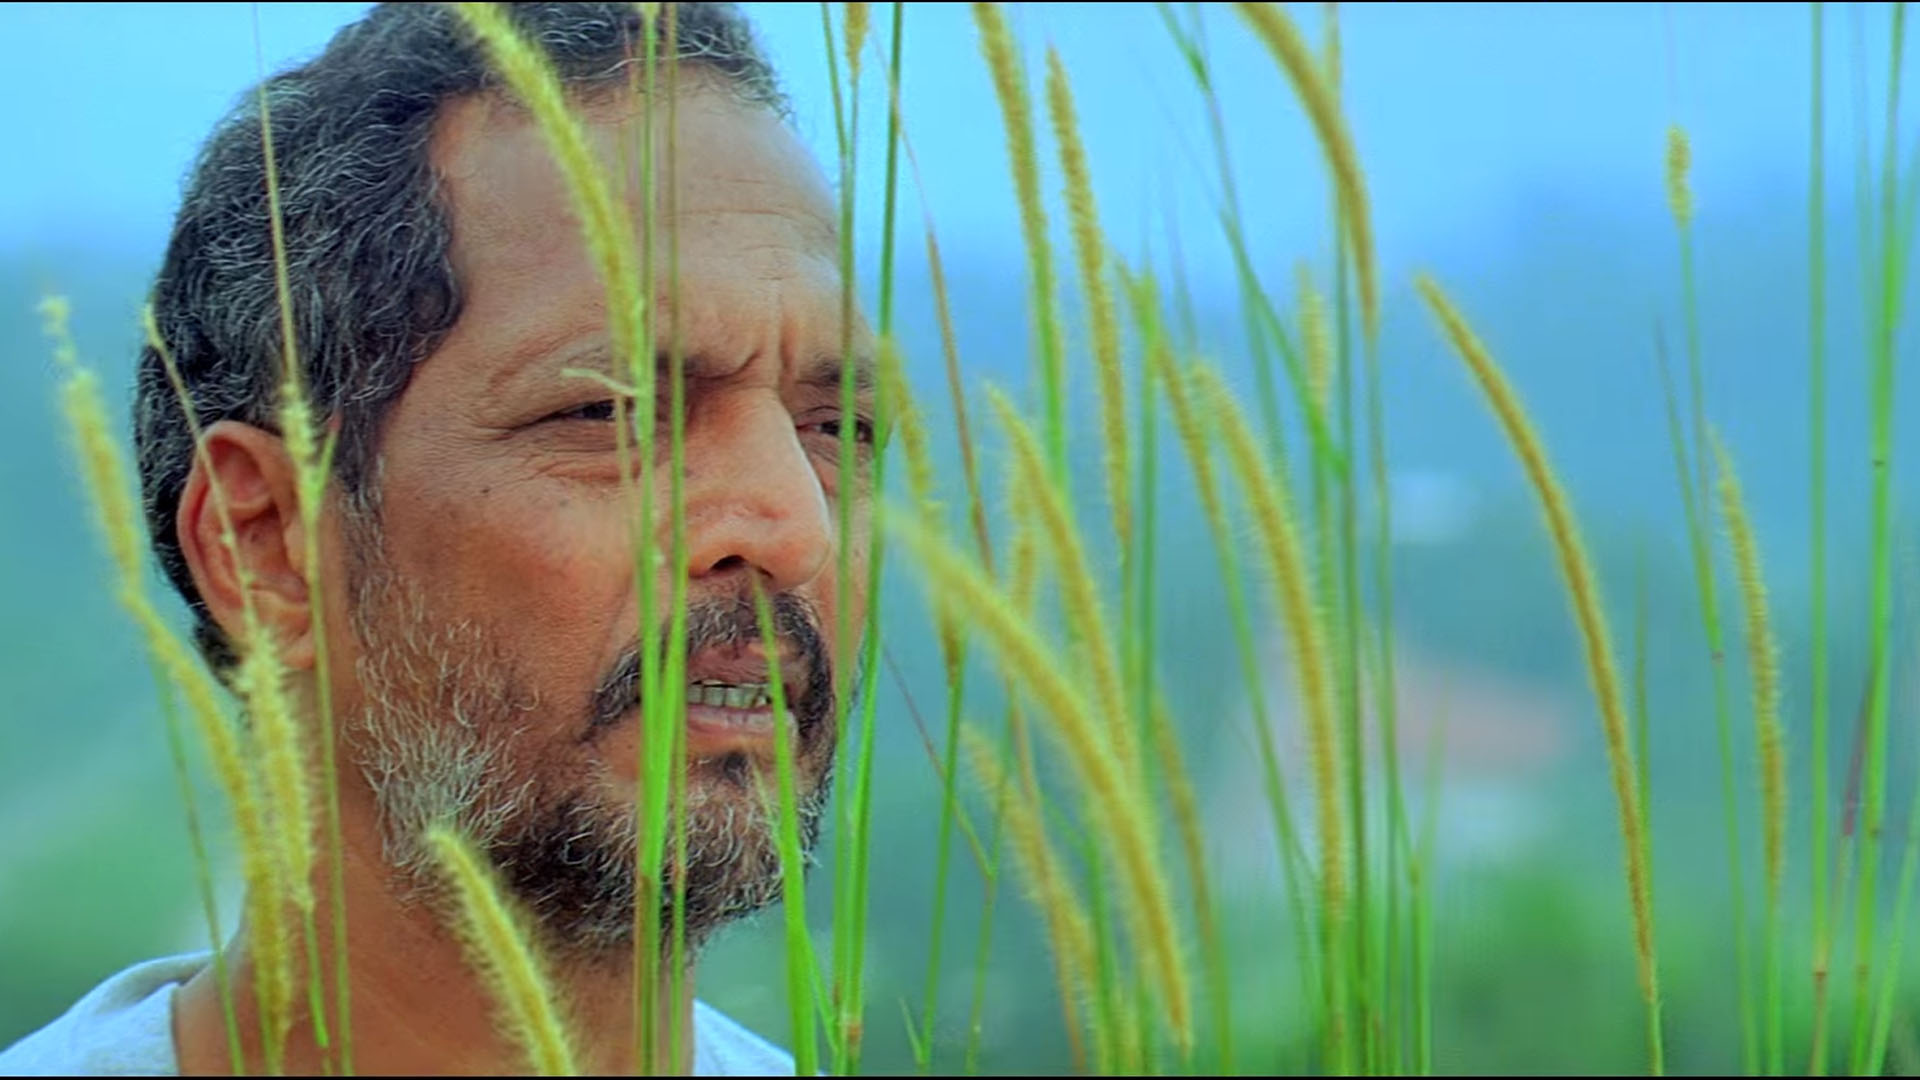 Final cut of director film stills